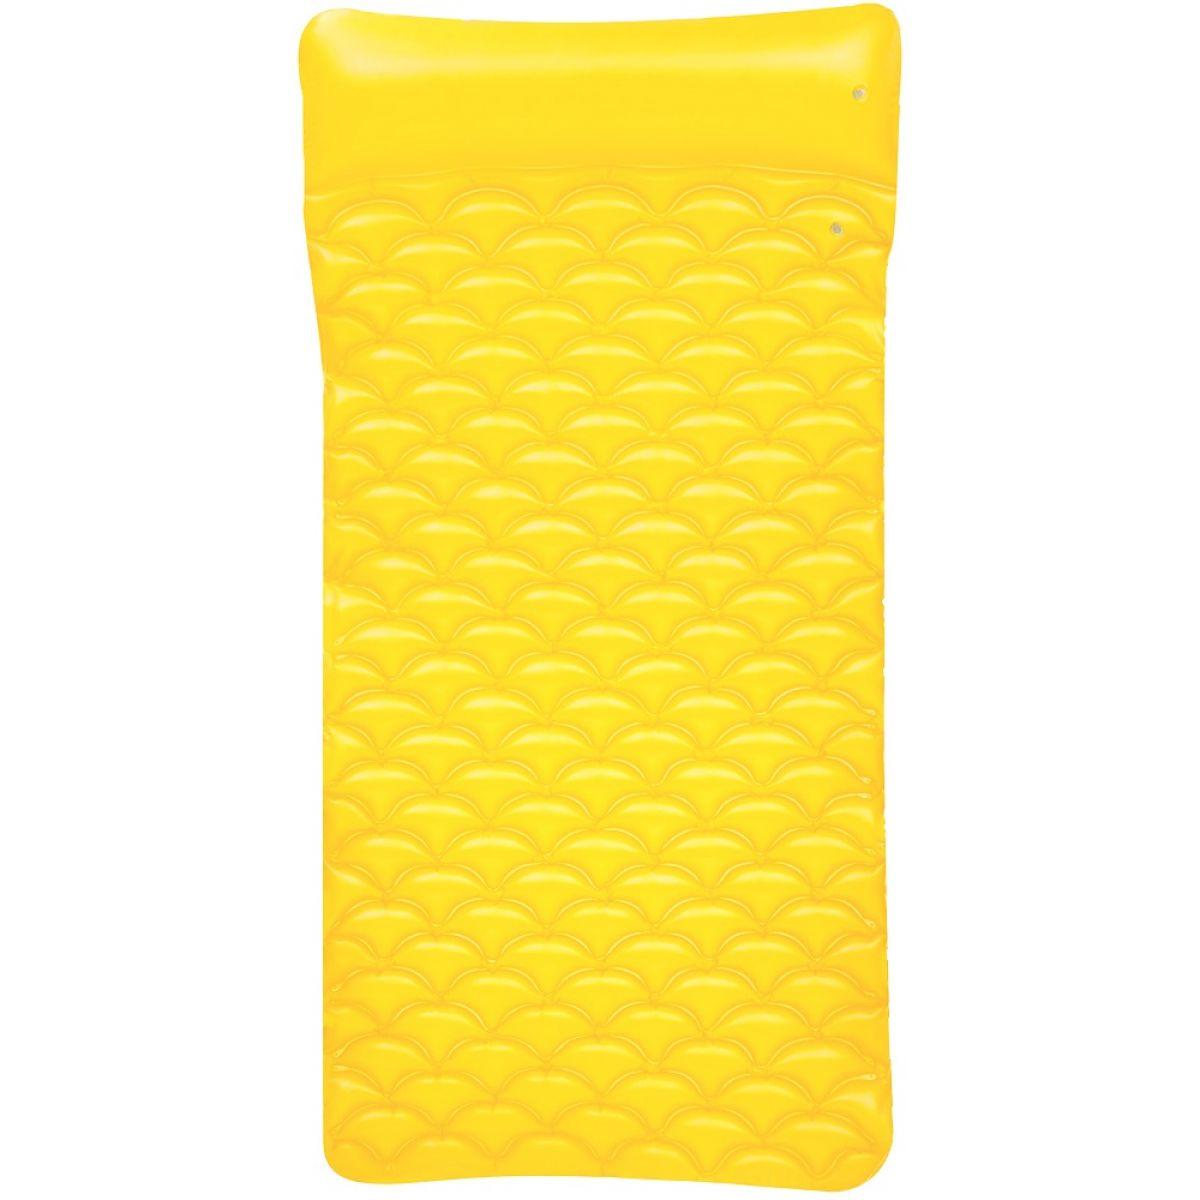 Bestway Nafukovací matrace 213 x 86 cm - Žlutá